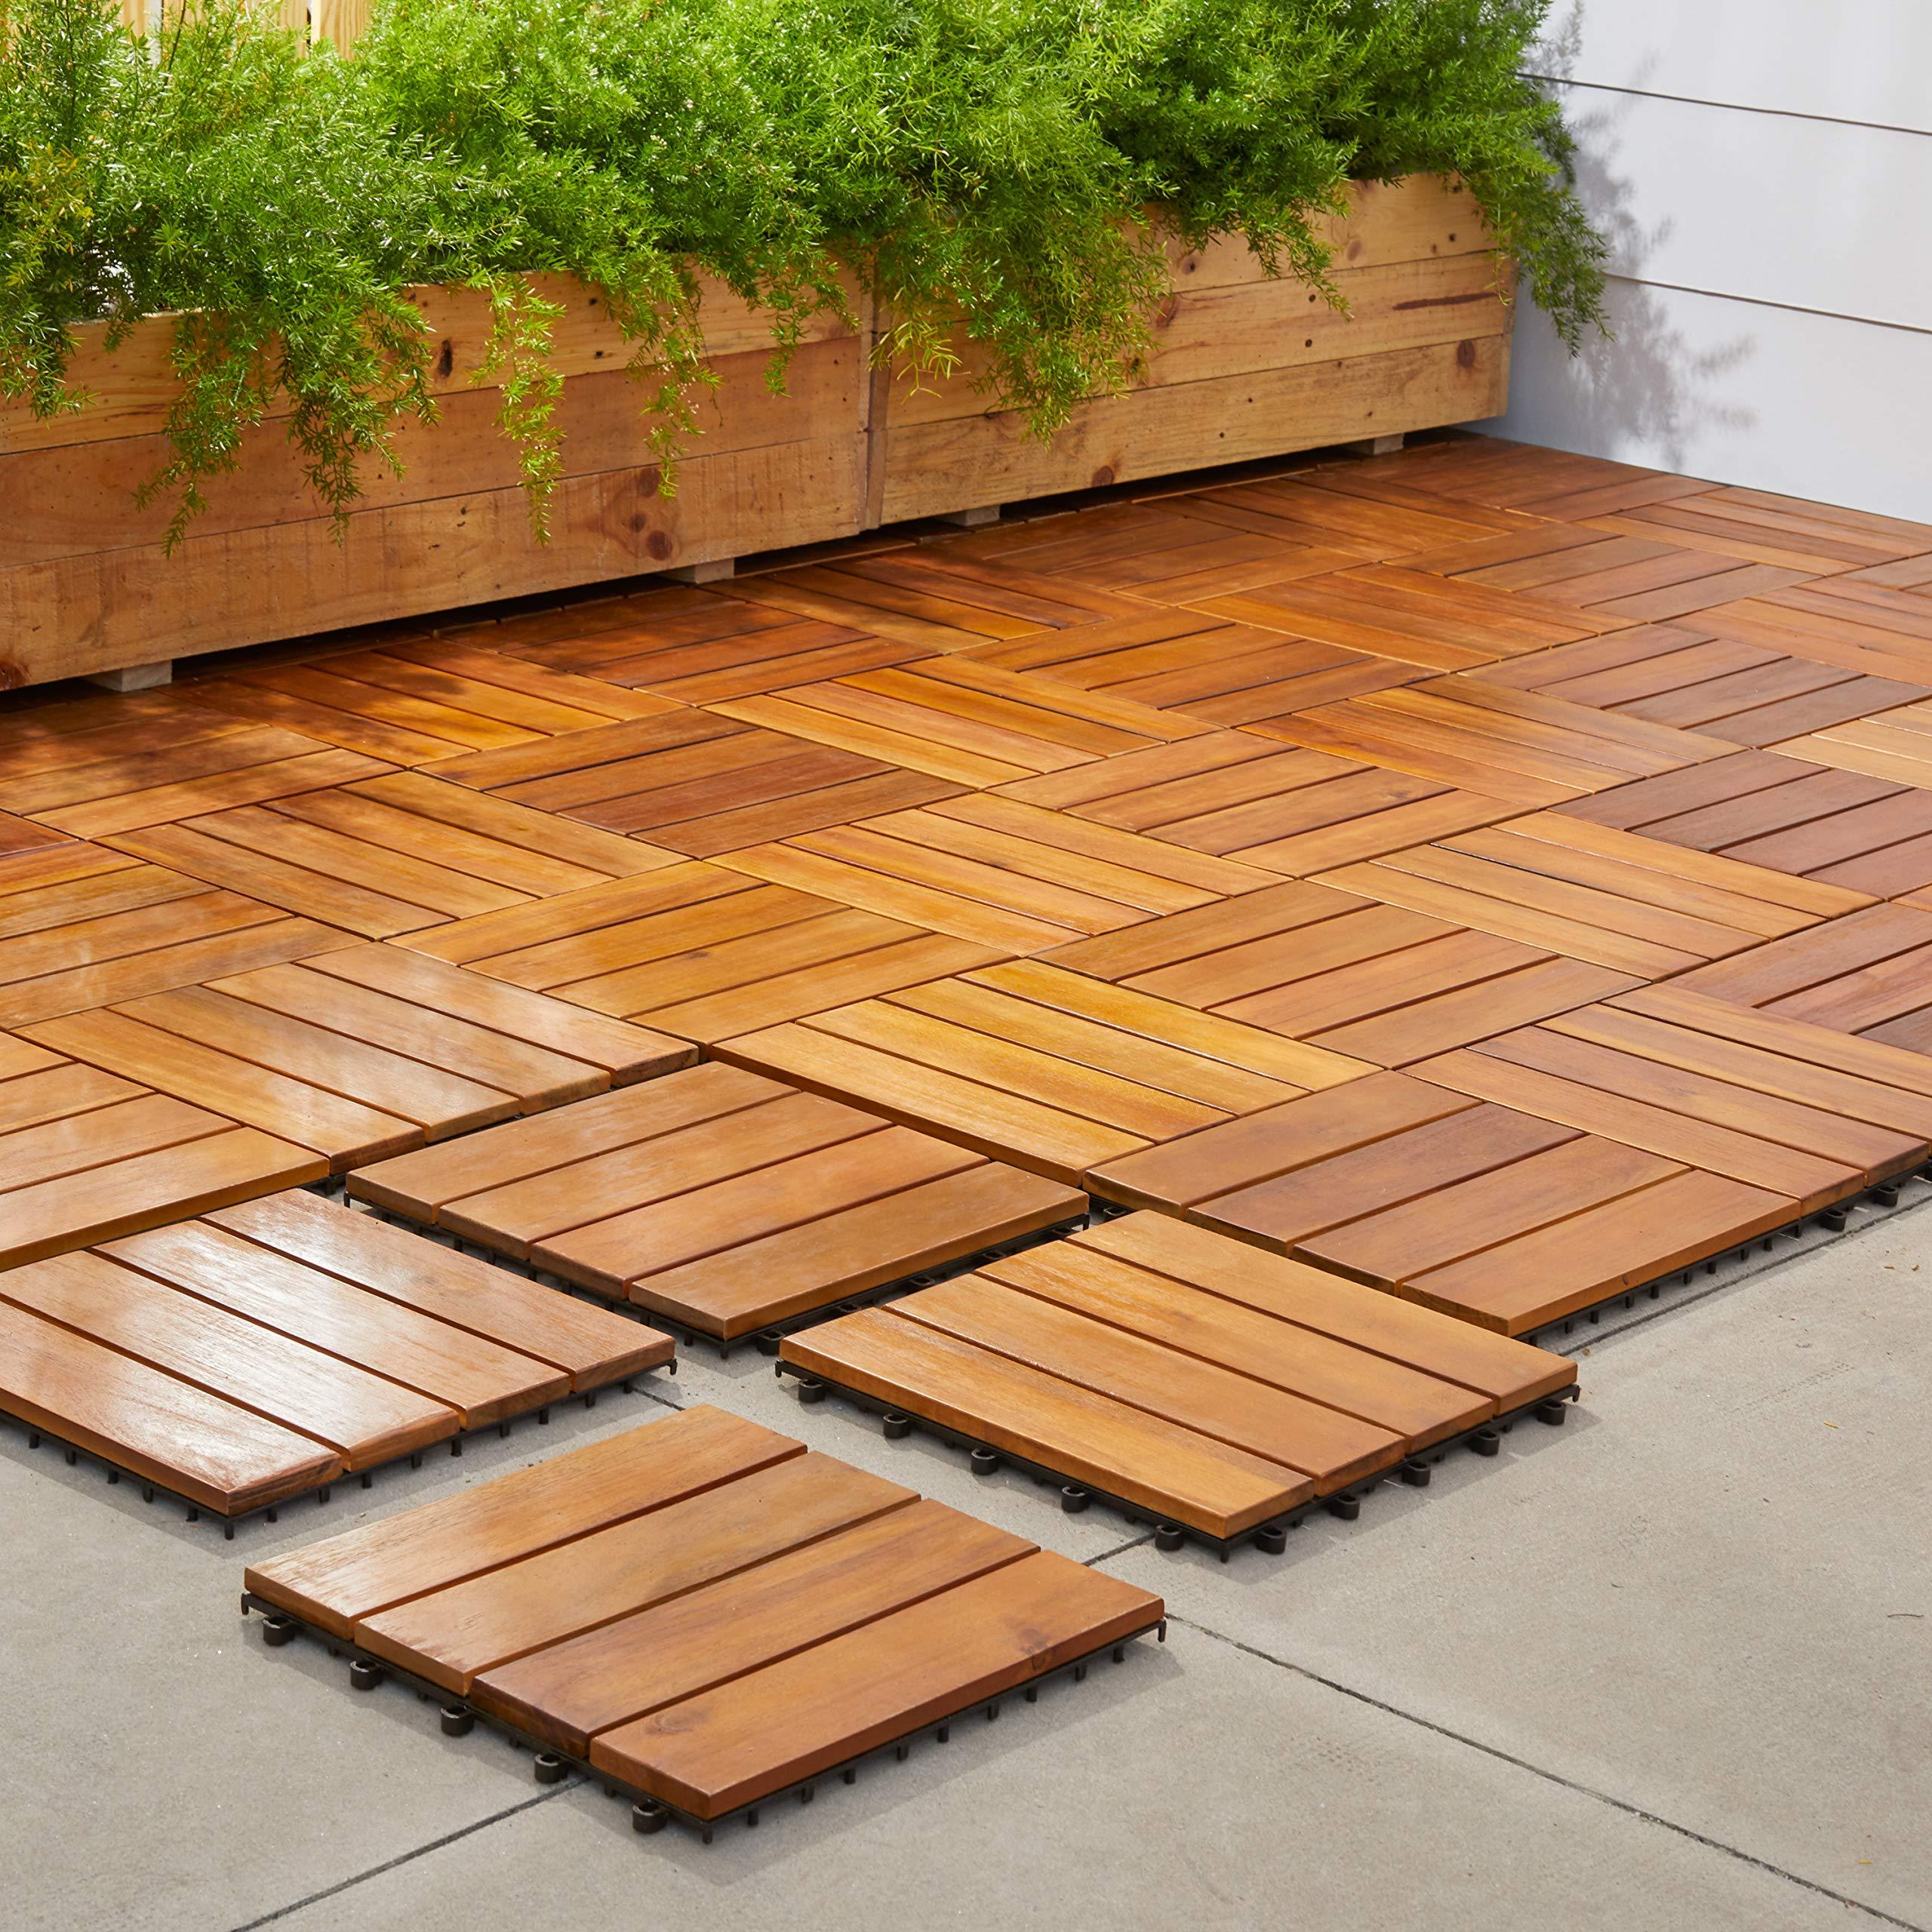 VIFAH V488 Interlocking Acacia Plantation Hardwood Deck Tile 4-Slat Style, 10-Pack, Teak Finish, 12 by 12 by 1-Inch by Vifah